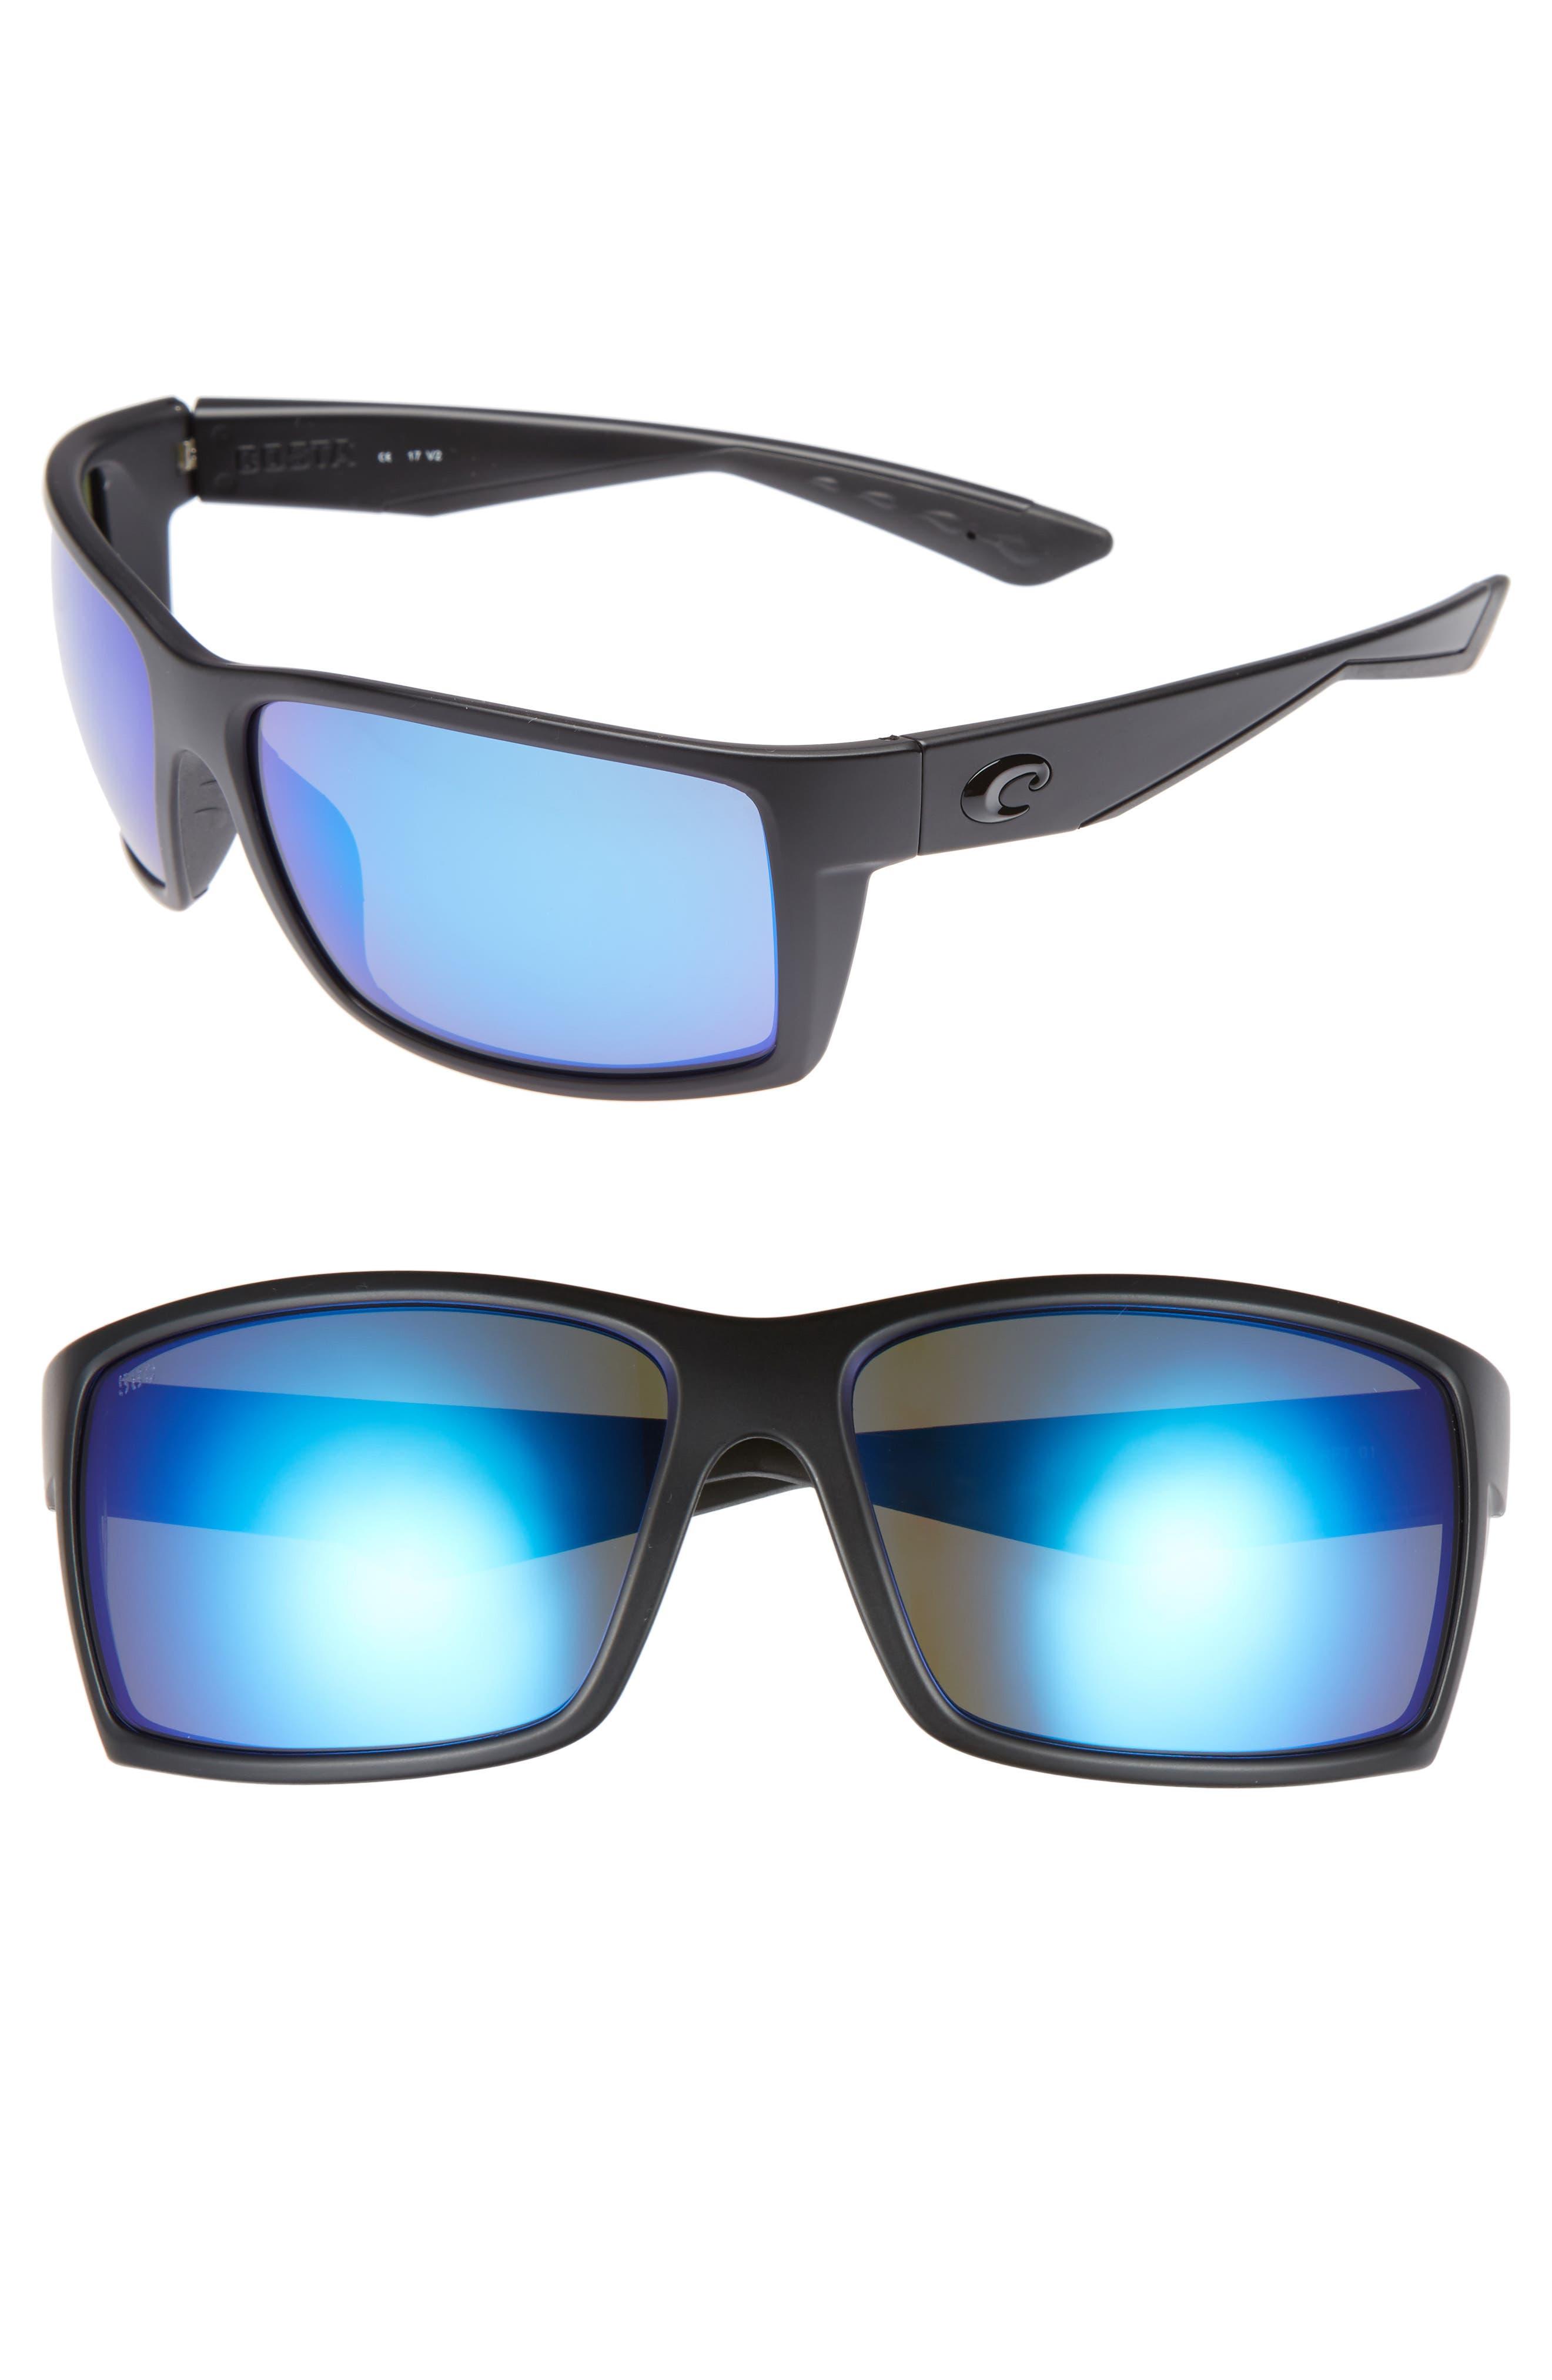 Reefton 65mm Polarized Sunglasses,                             Main thumbnail 1, color,                             Blackout/ Blue Mirror